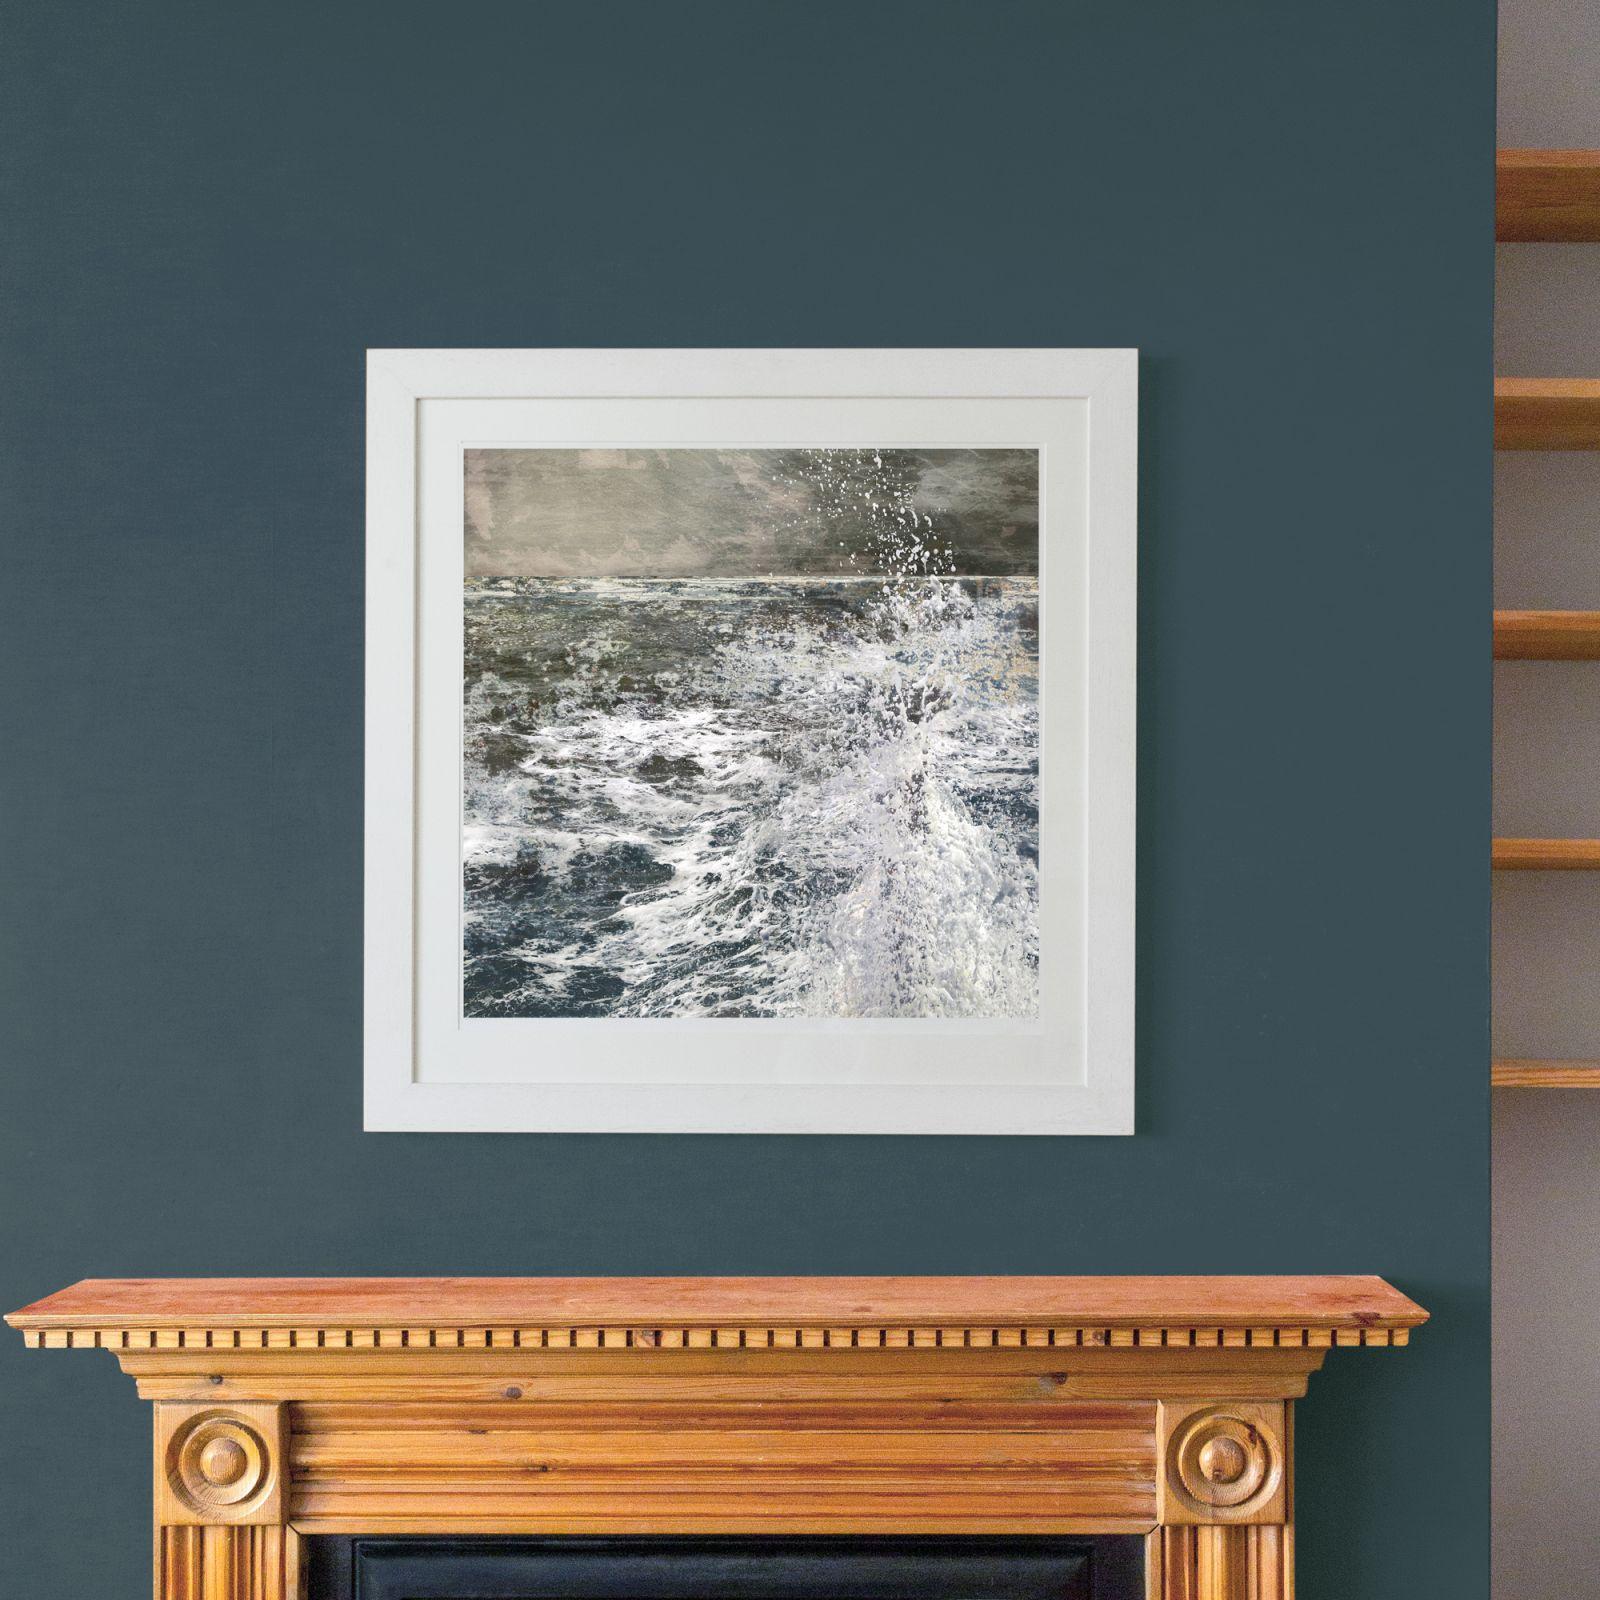 Framed art, Art in situ, Art walls, art for interiors, seascapes, coastal art, Claire gill, artist claire gill, limited edition coastal print, contemporary fine art prints